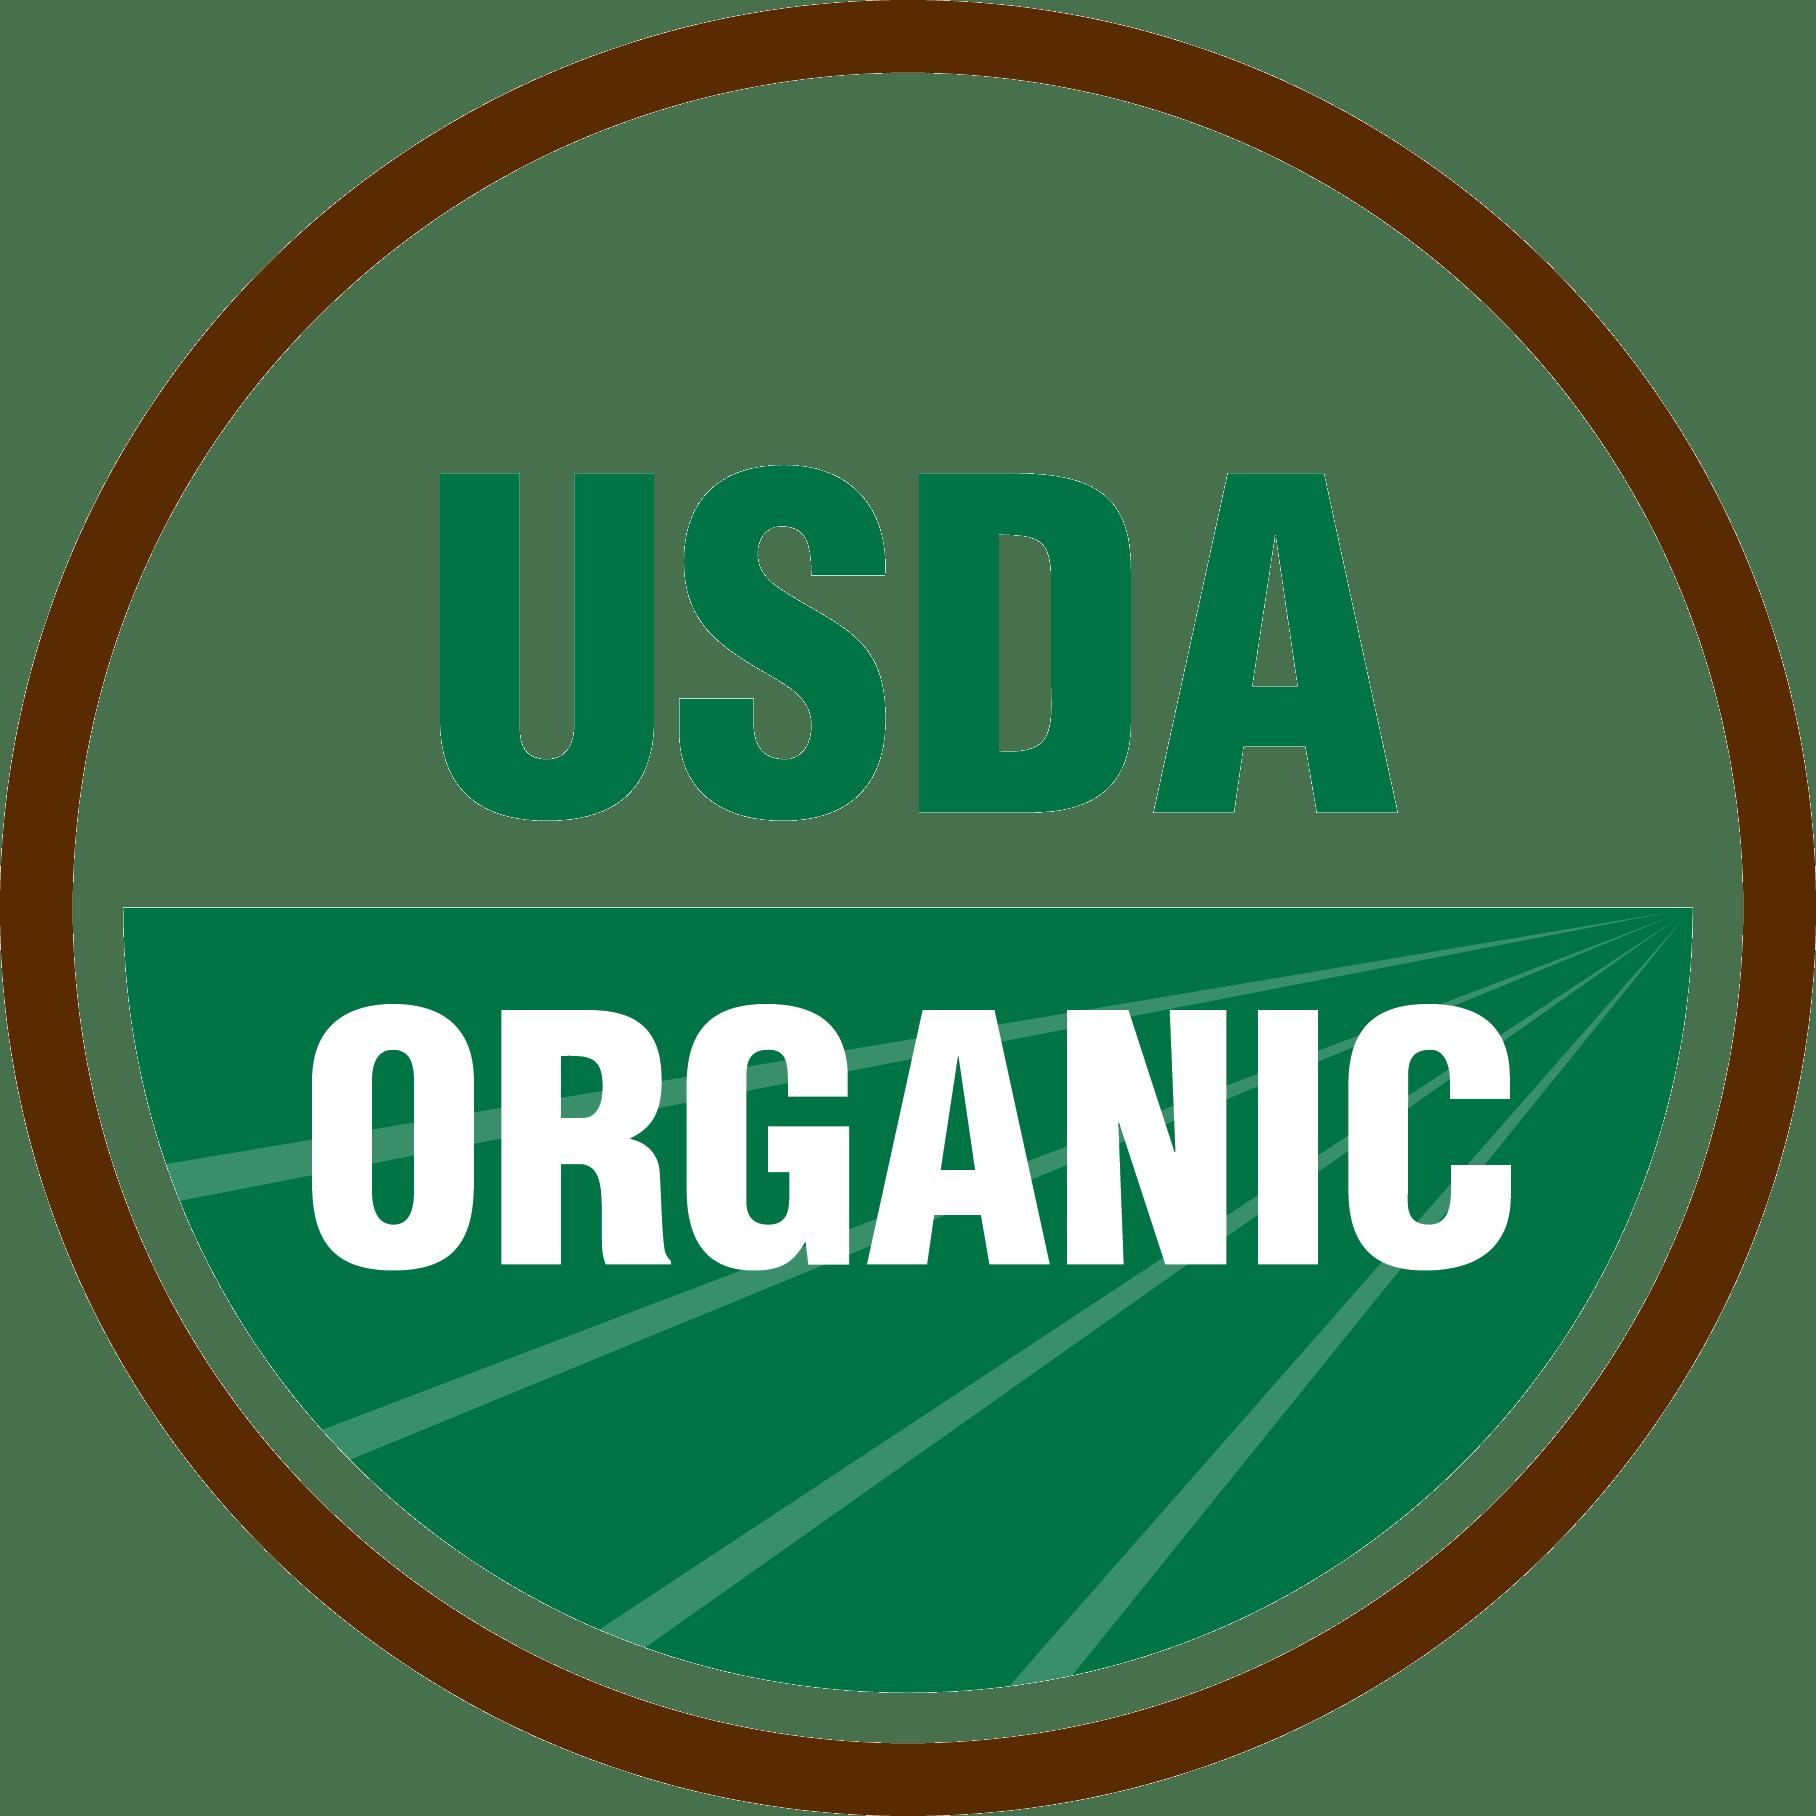 OrganicUSA